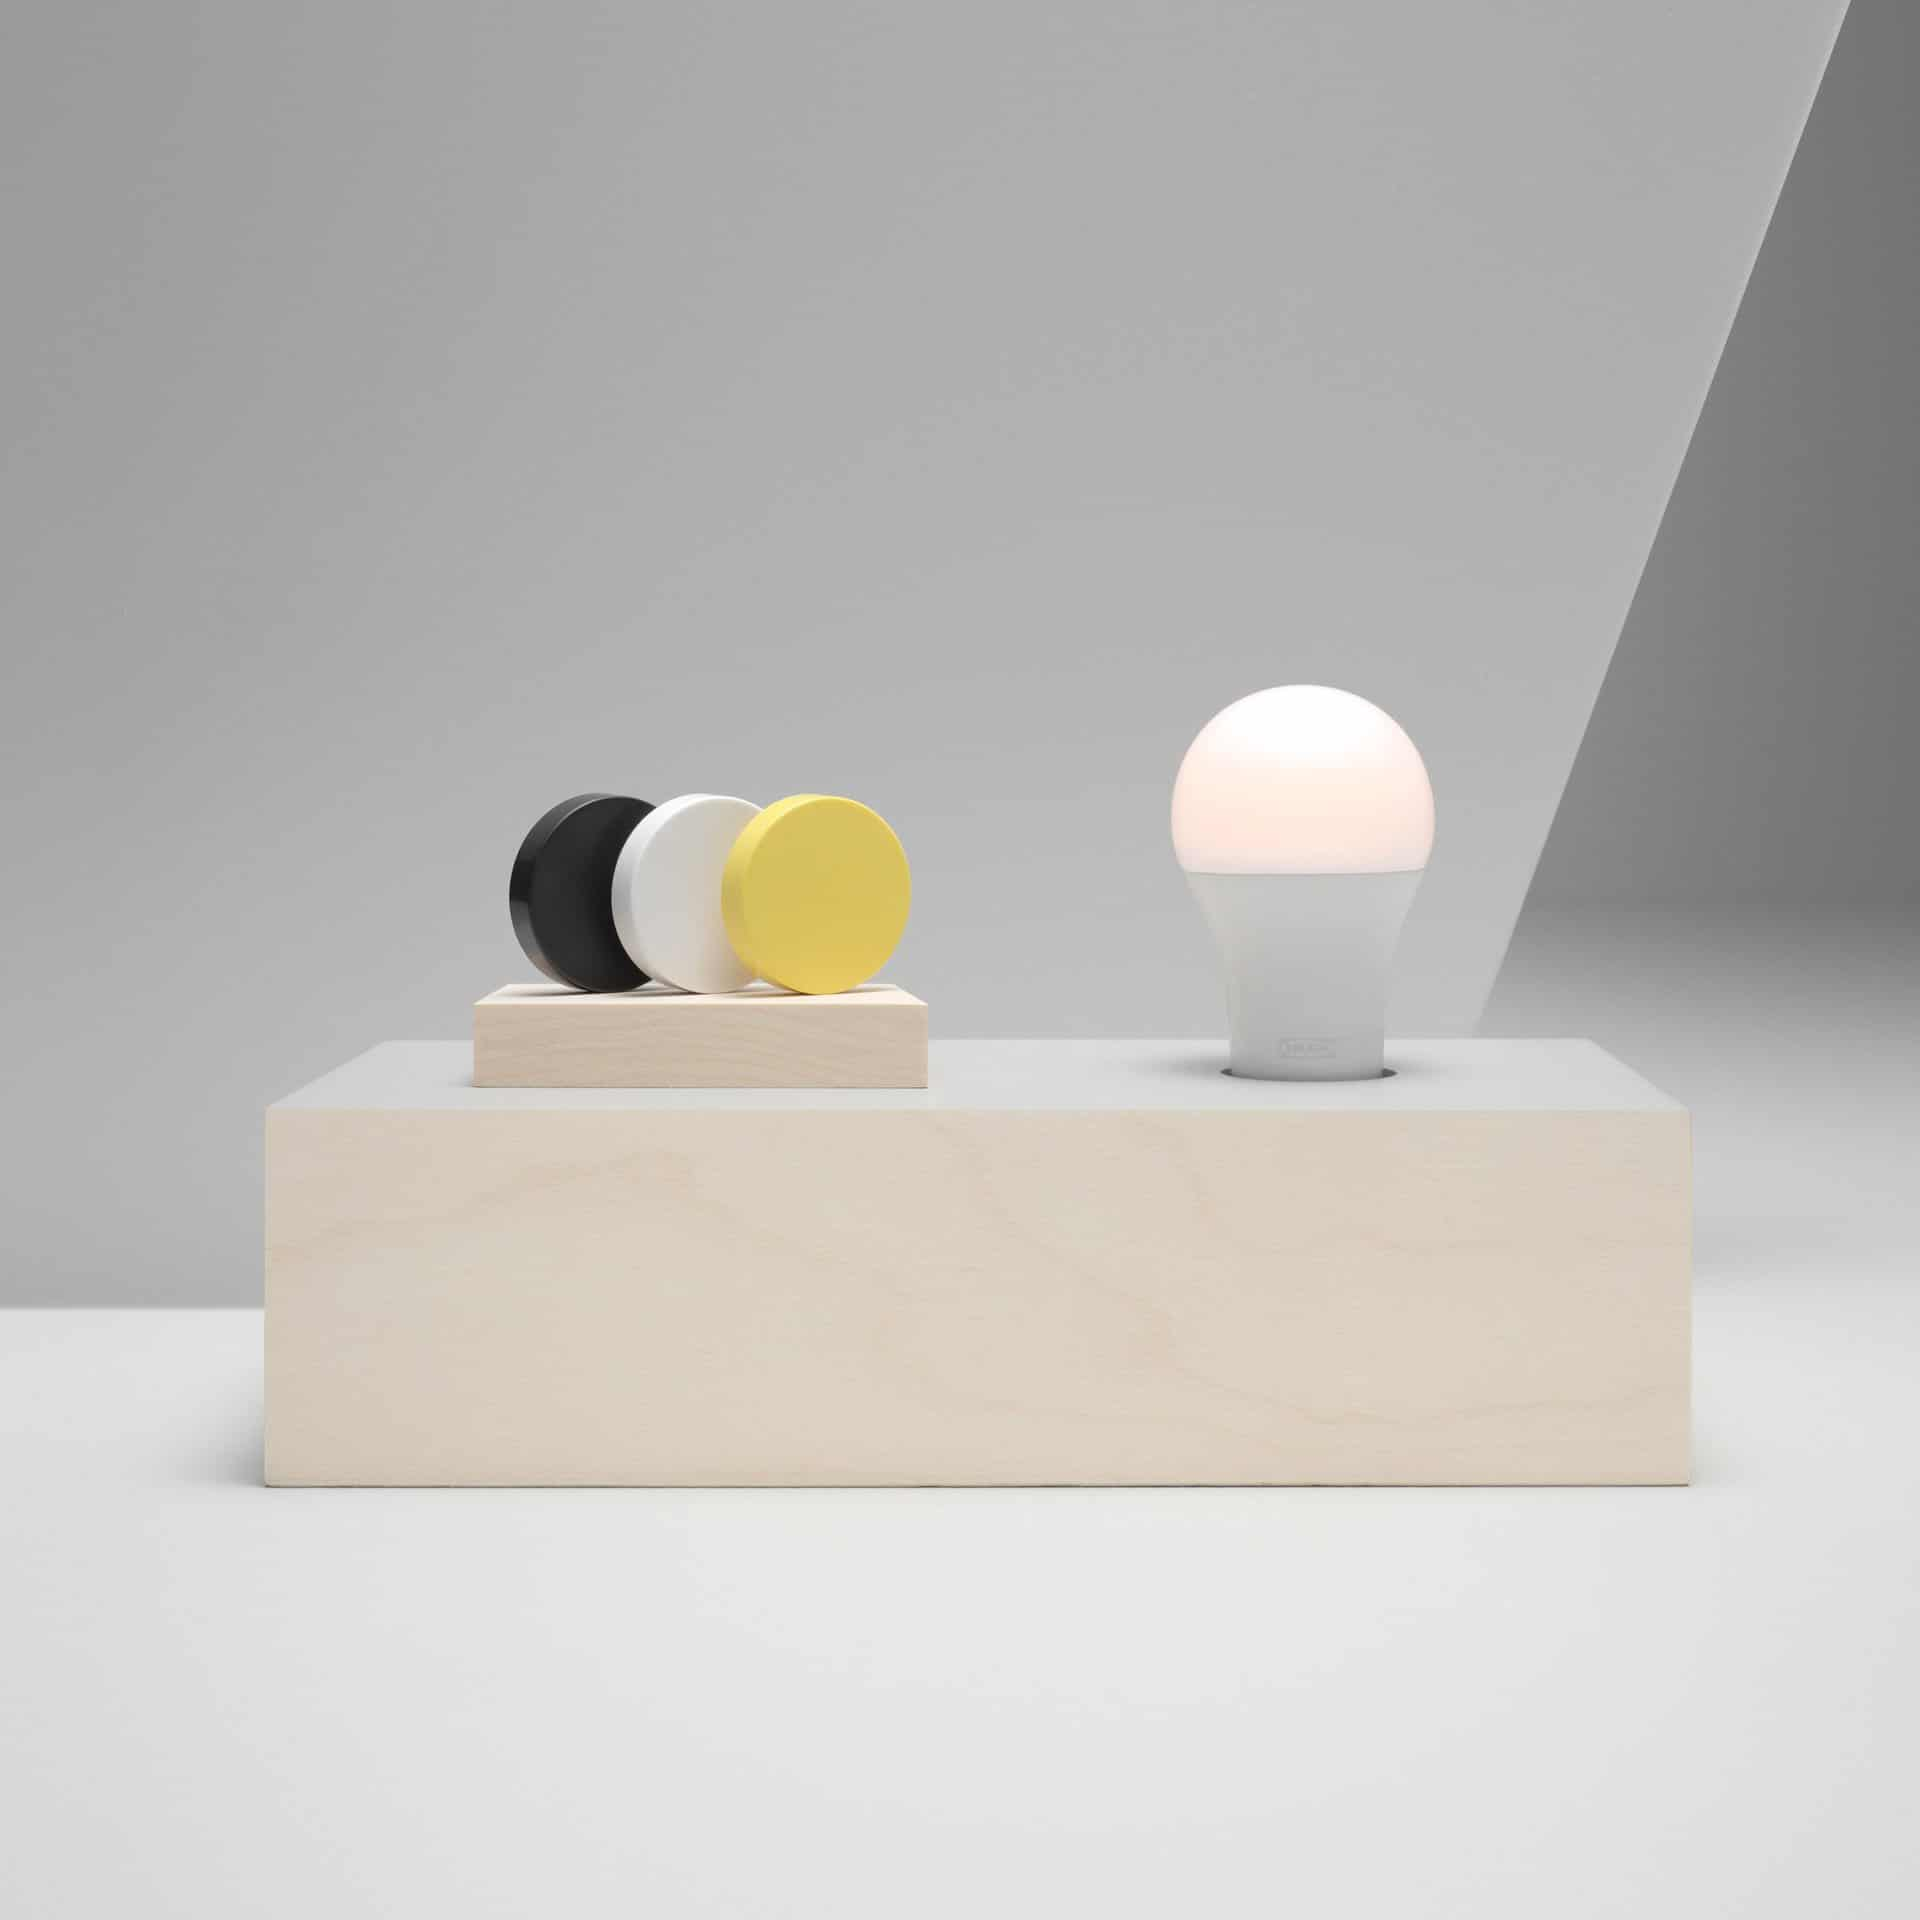 Ikea Trådfri HomeKit